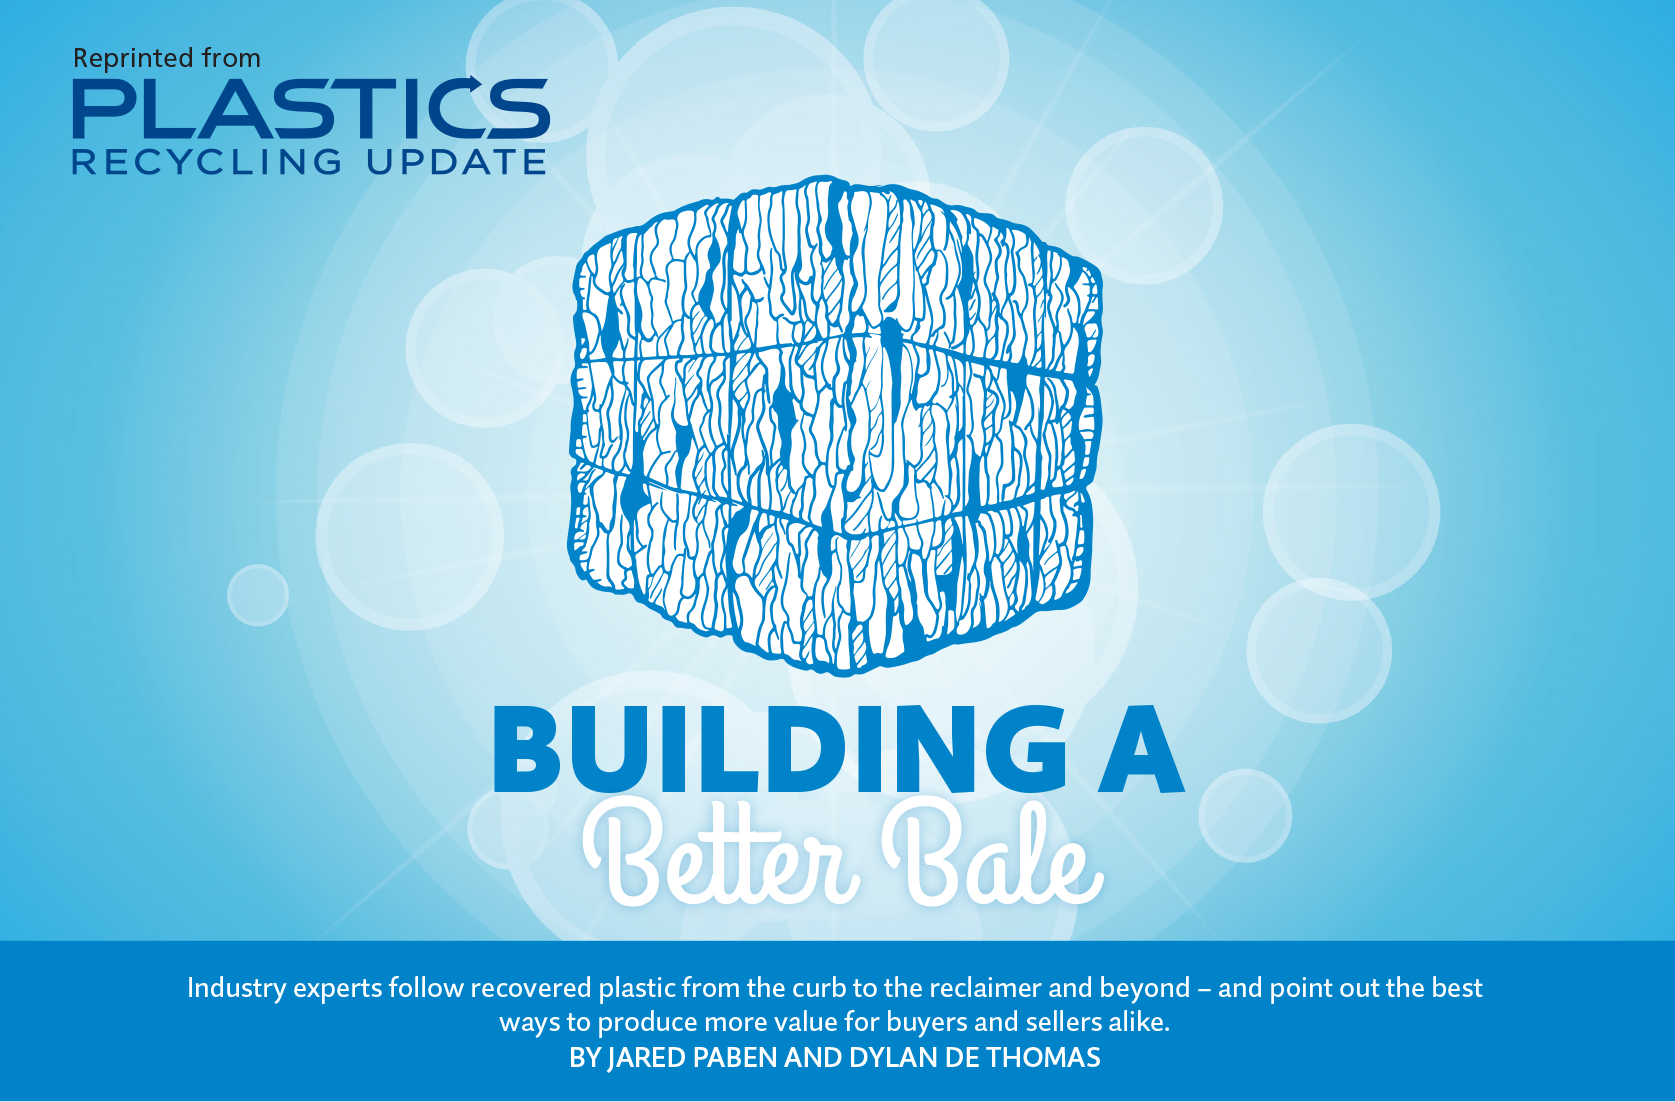 Building a better bale